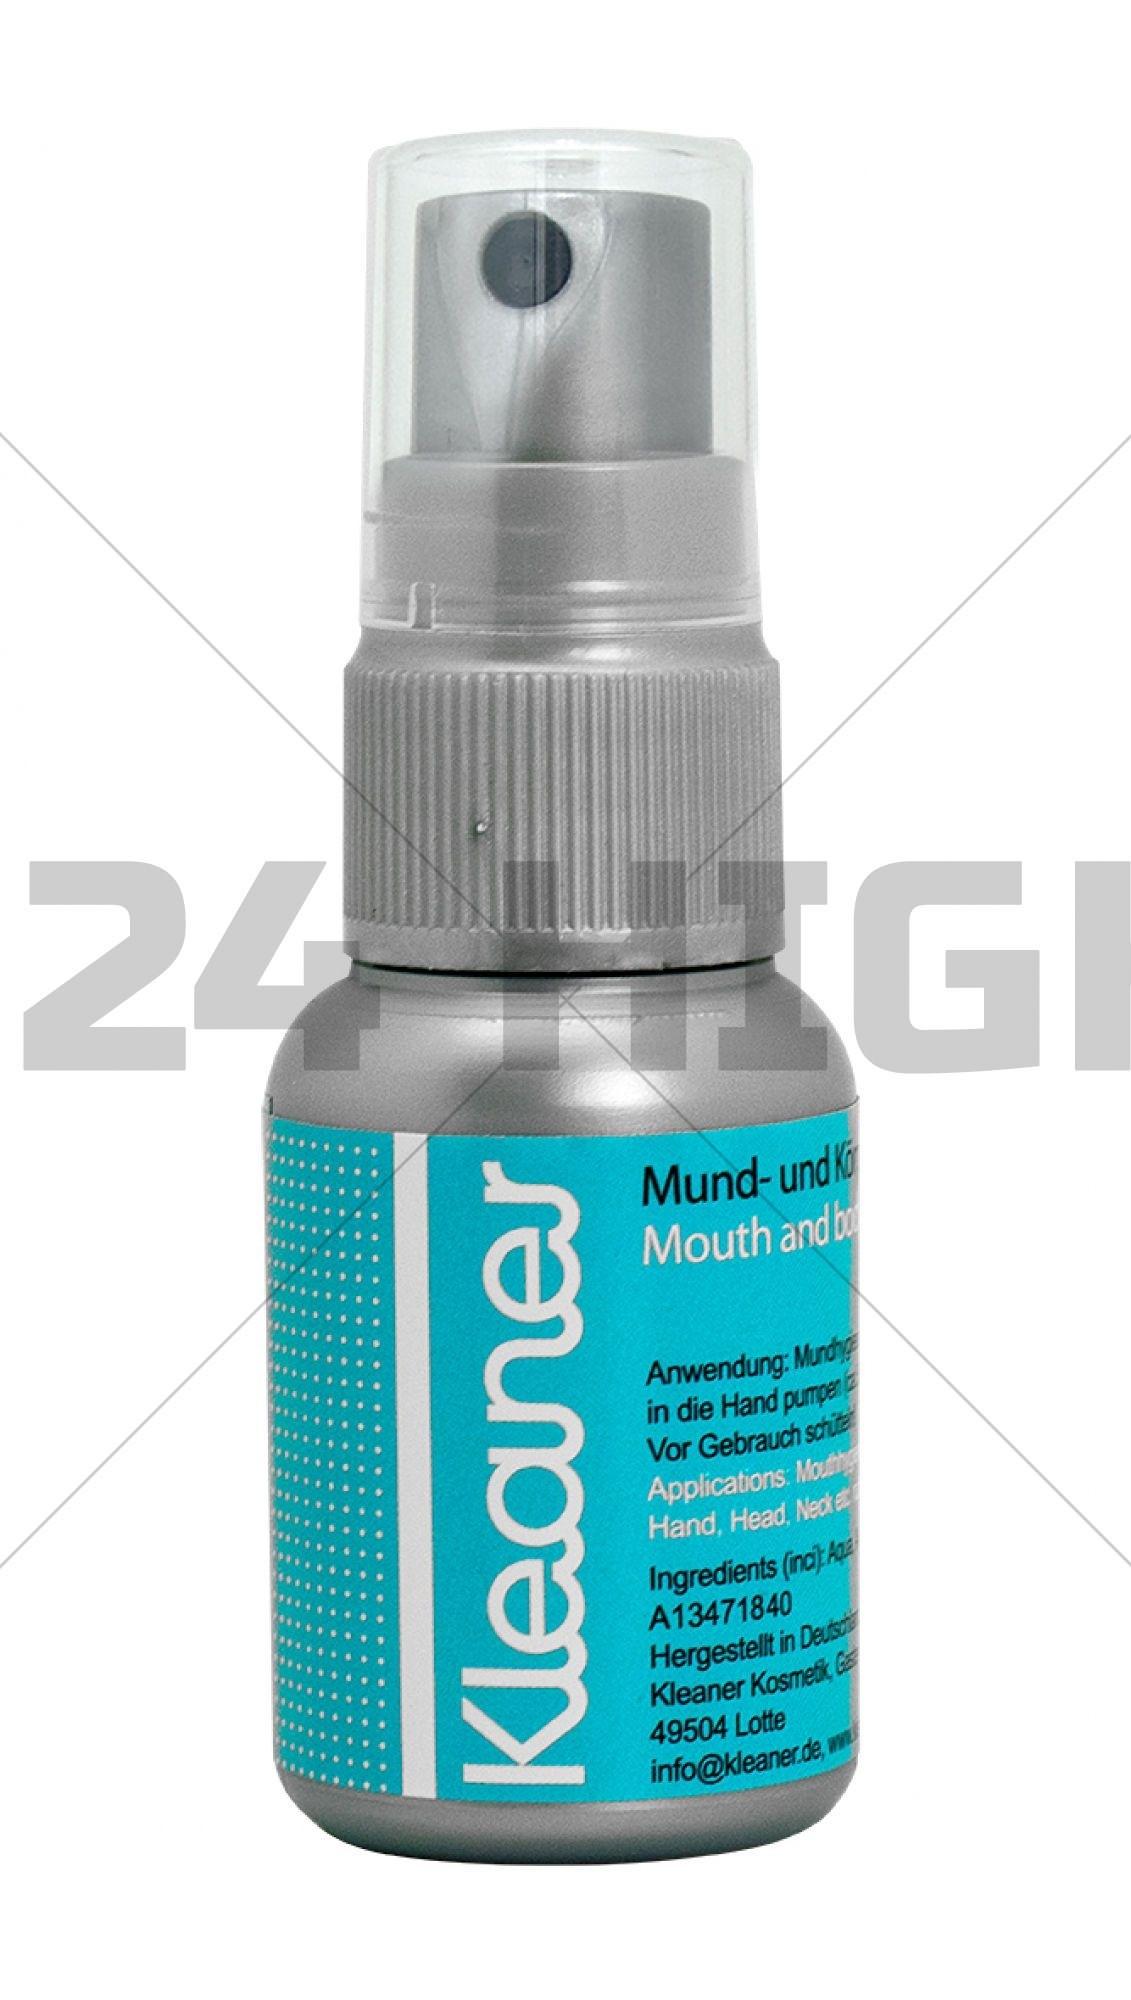 Kleaner Bottle 30 ml (elimina trazas de drogas)